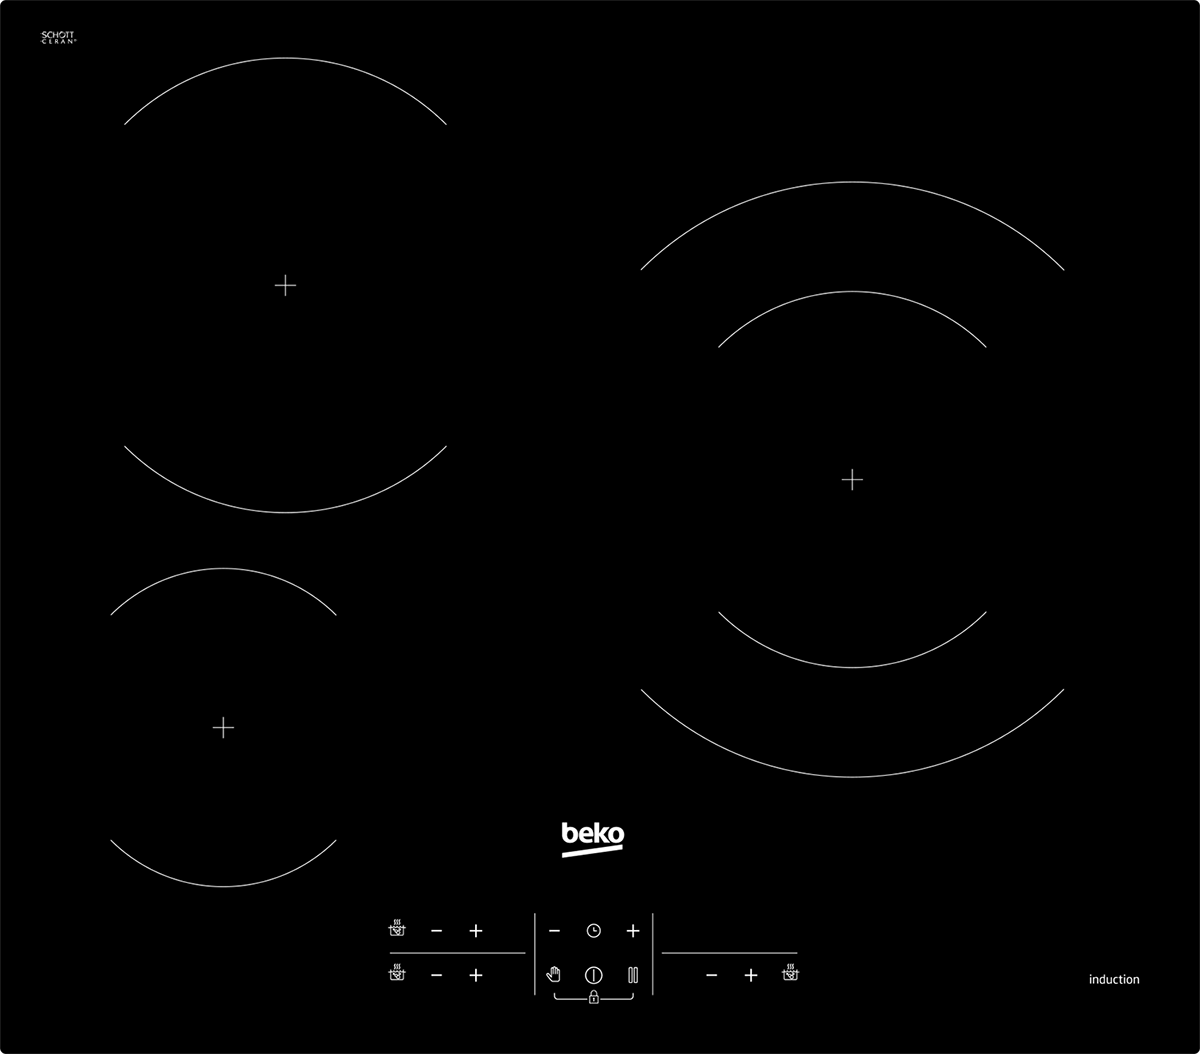 Table Induction Beko Hiis63205